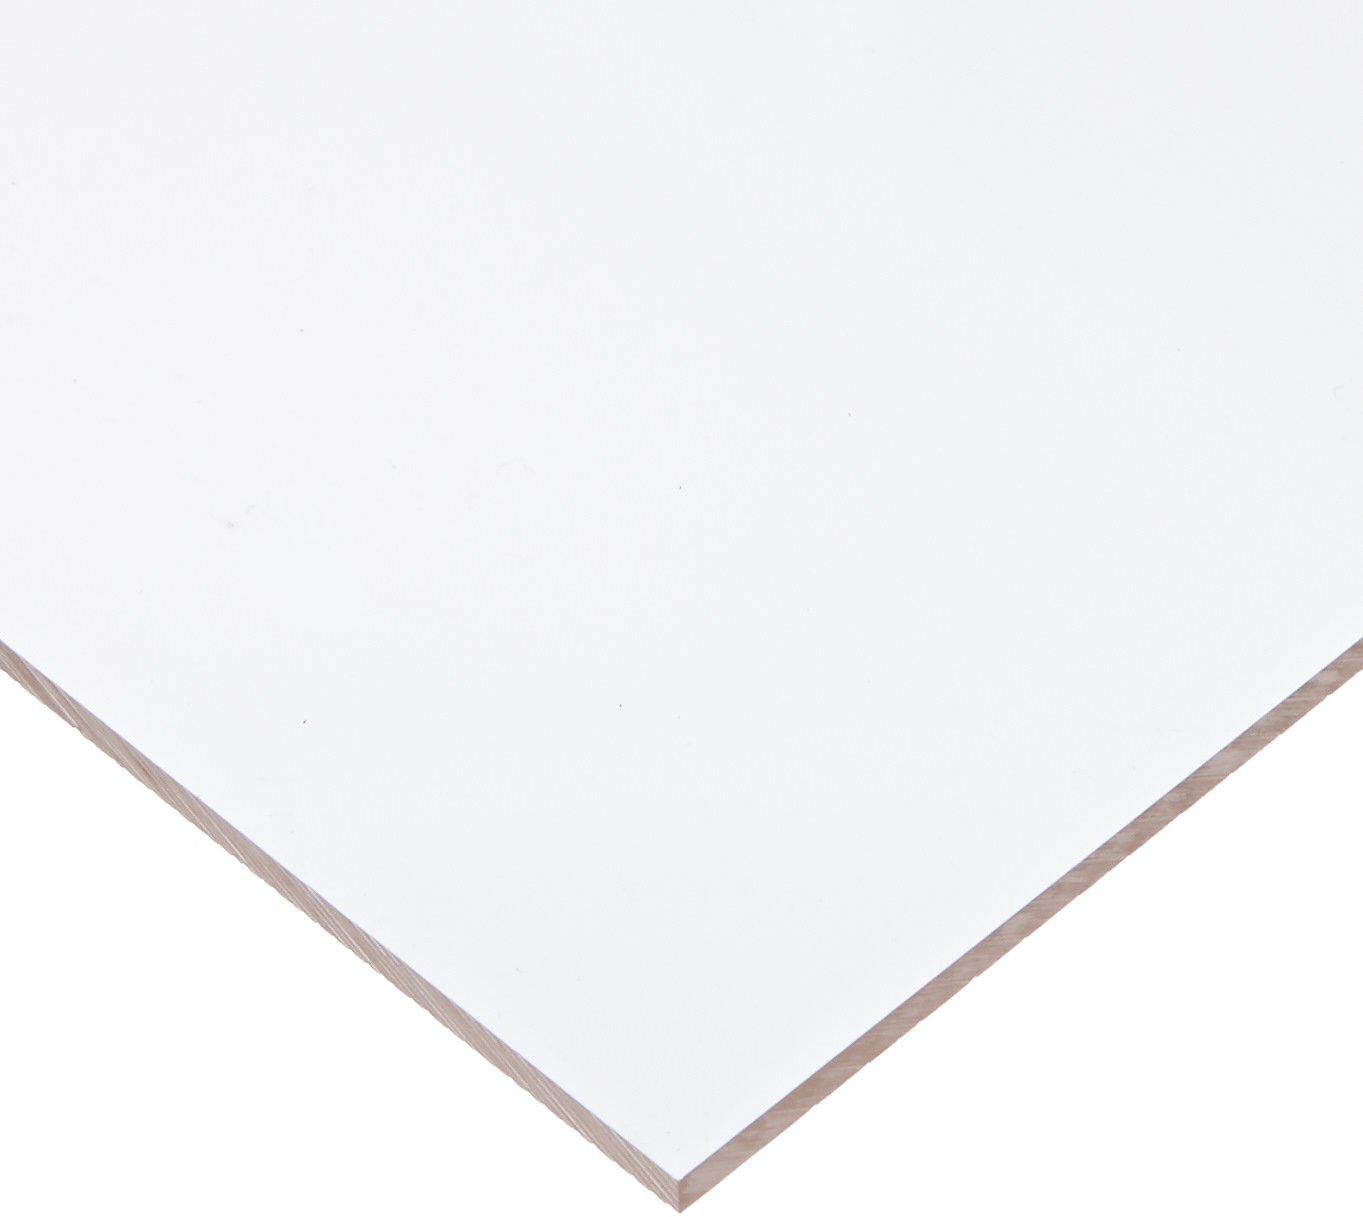 Cast Acrylic Sheet, Clear, 12'' x 12'' Size